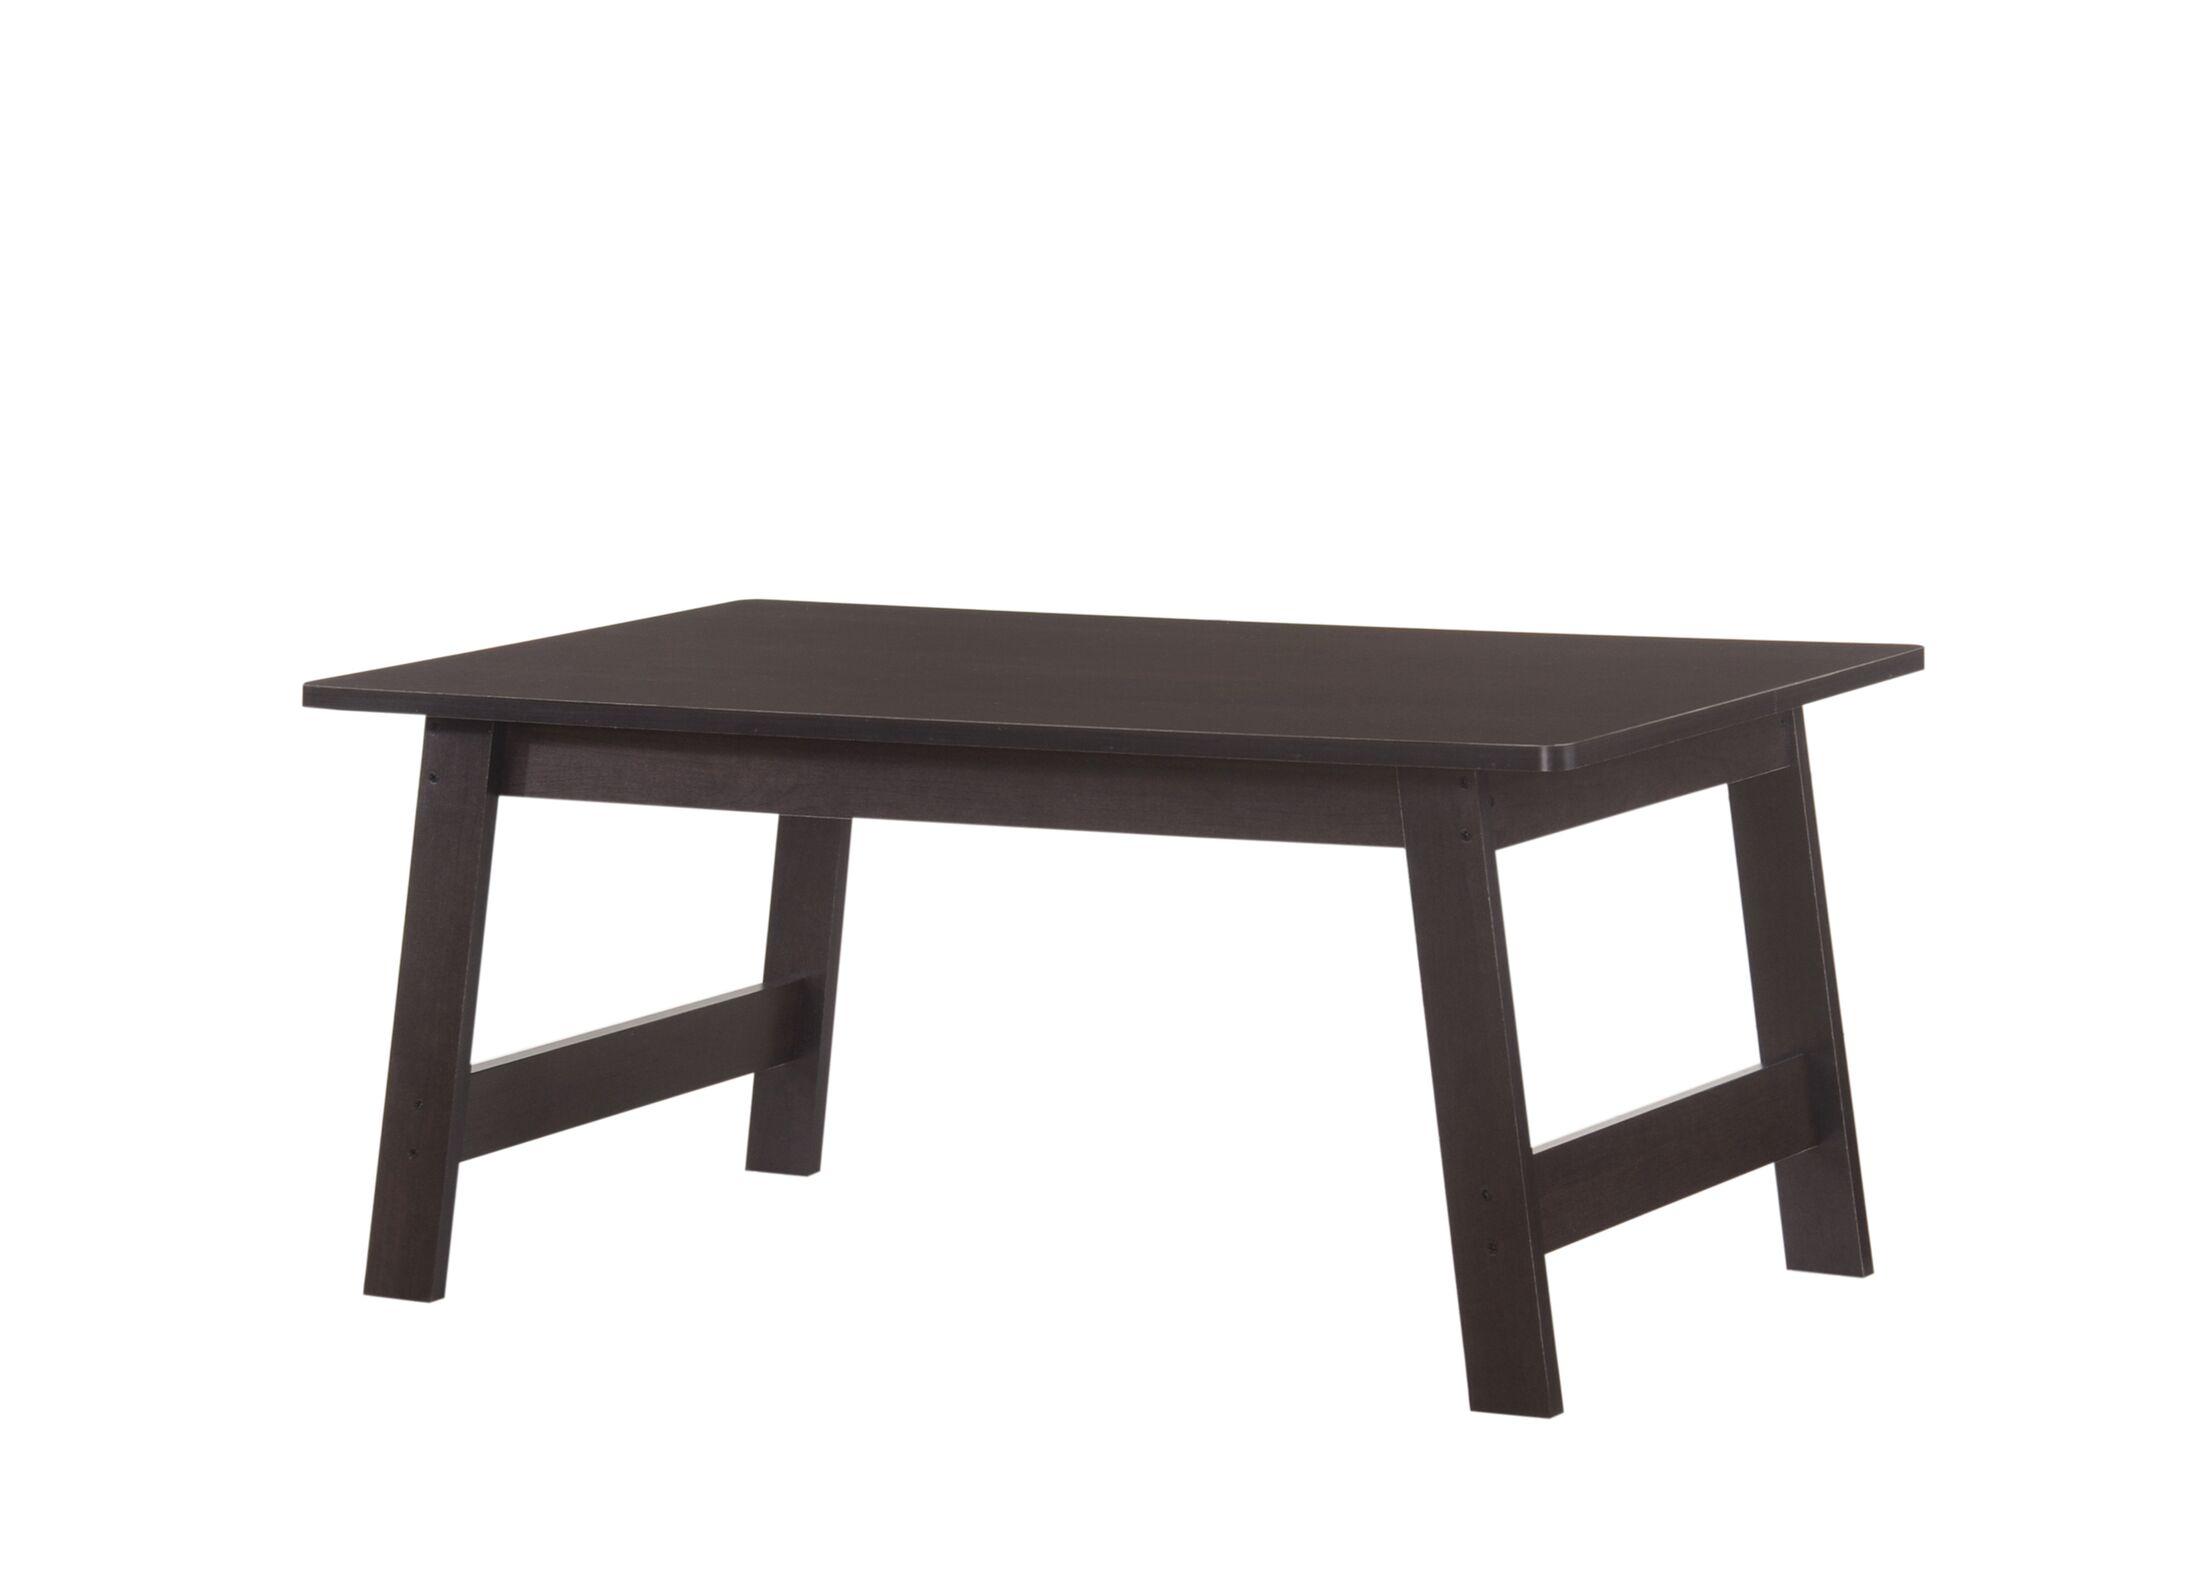 Halethorpe 3 Piece Coffee Table Set Color: Dark Taupe